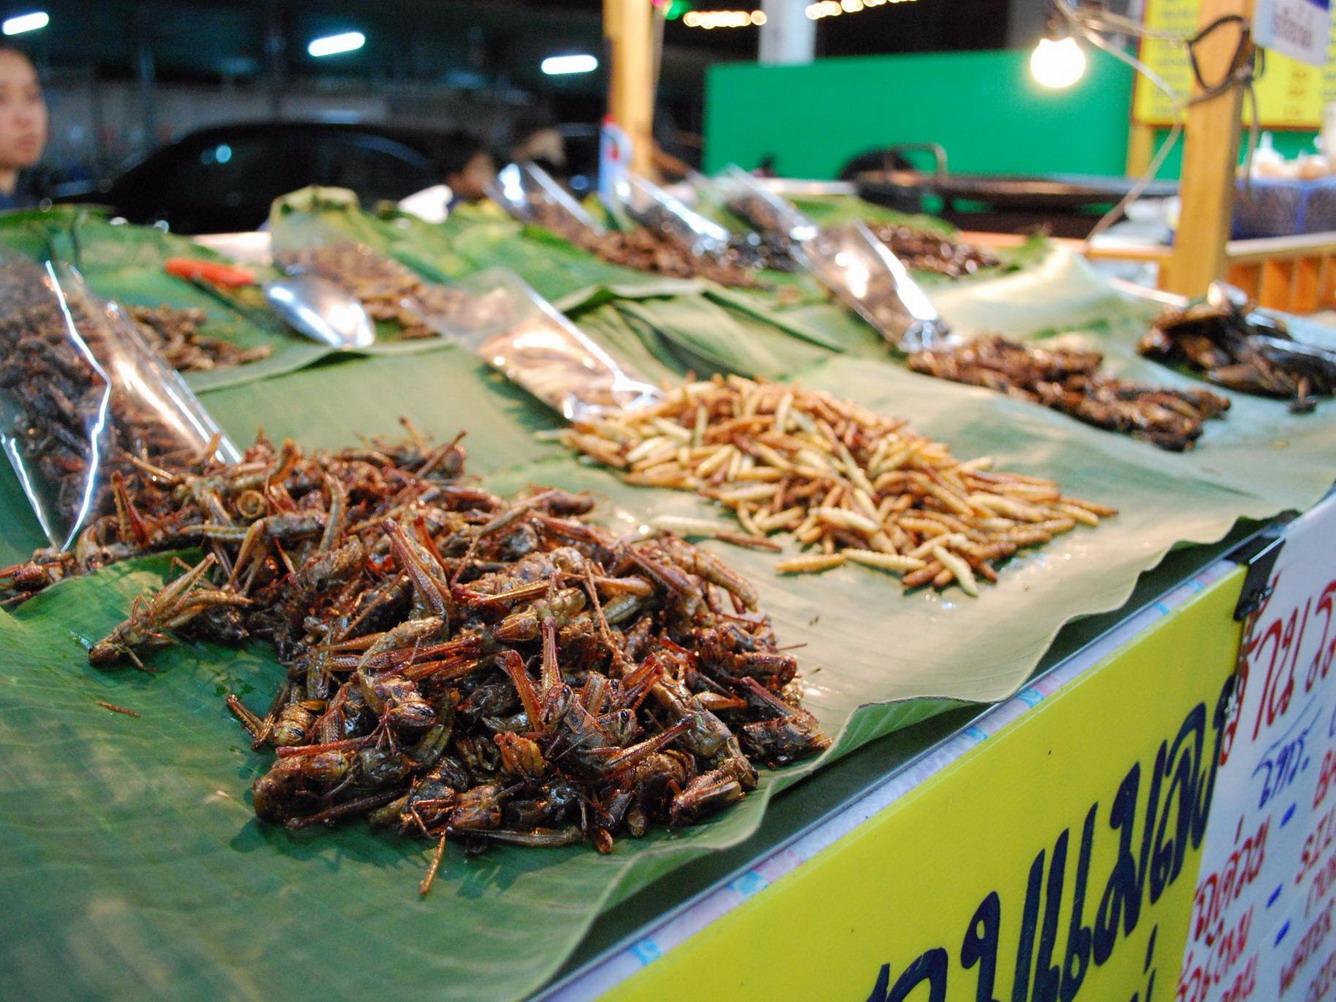 5 dac san di noi tieng thai lan: khong du gan do dam thuong thuc hinh anh 11